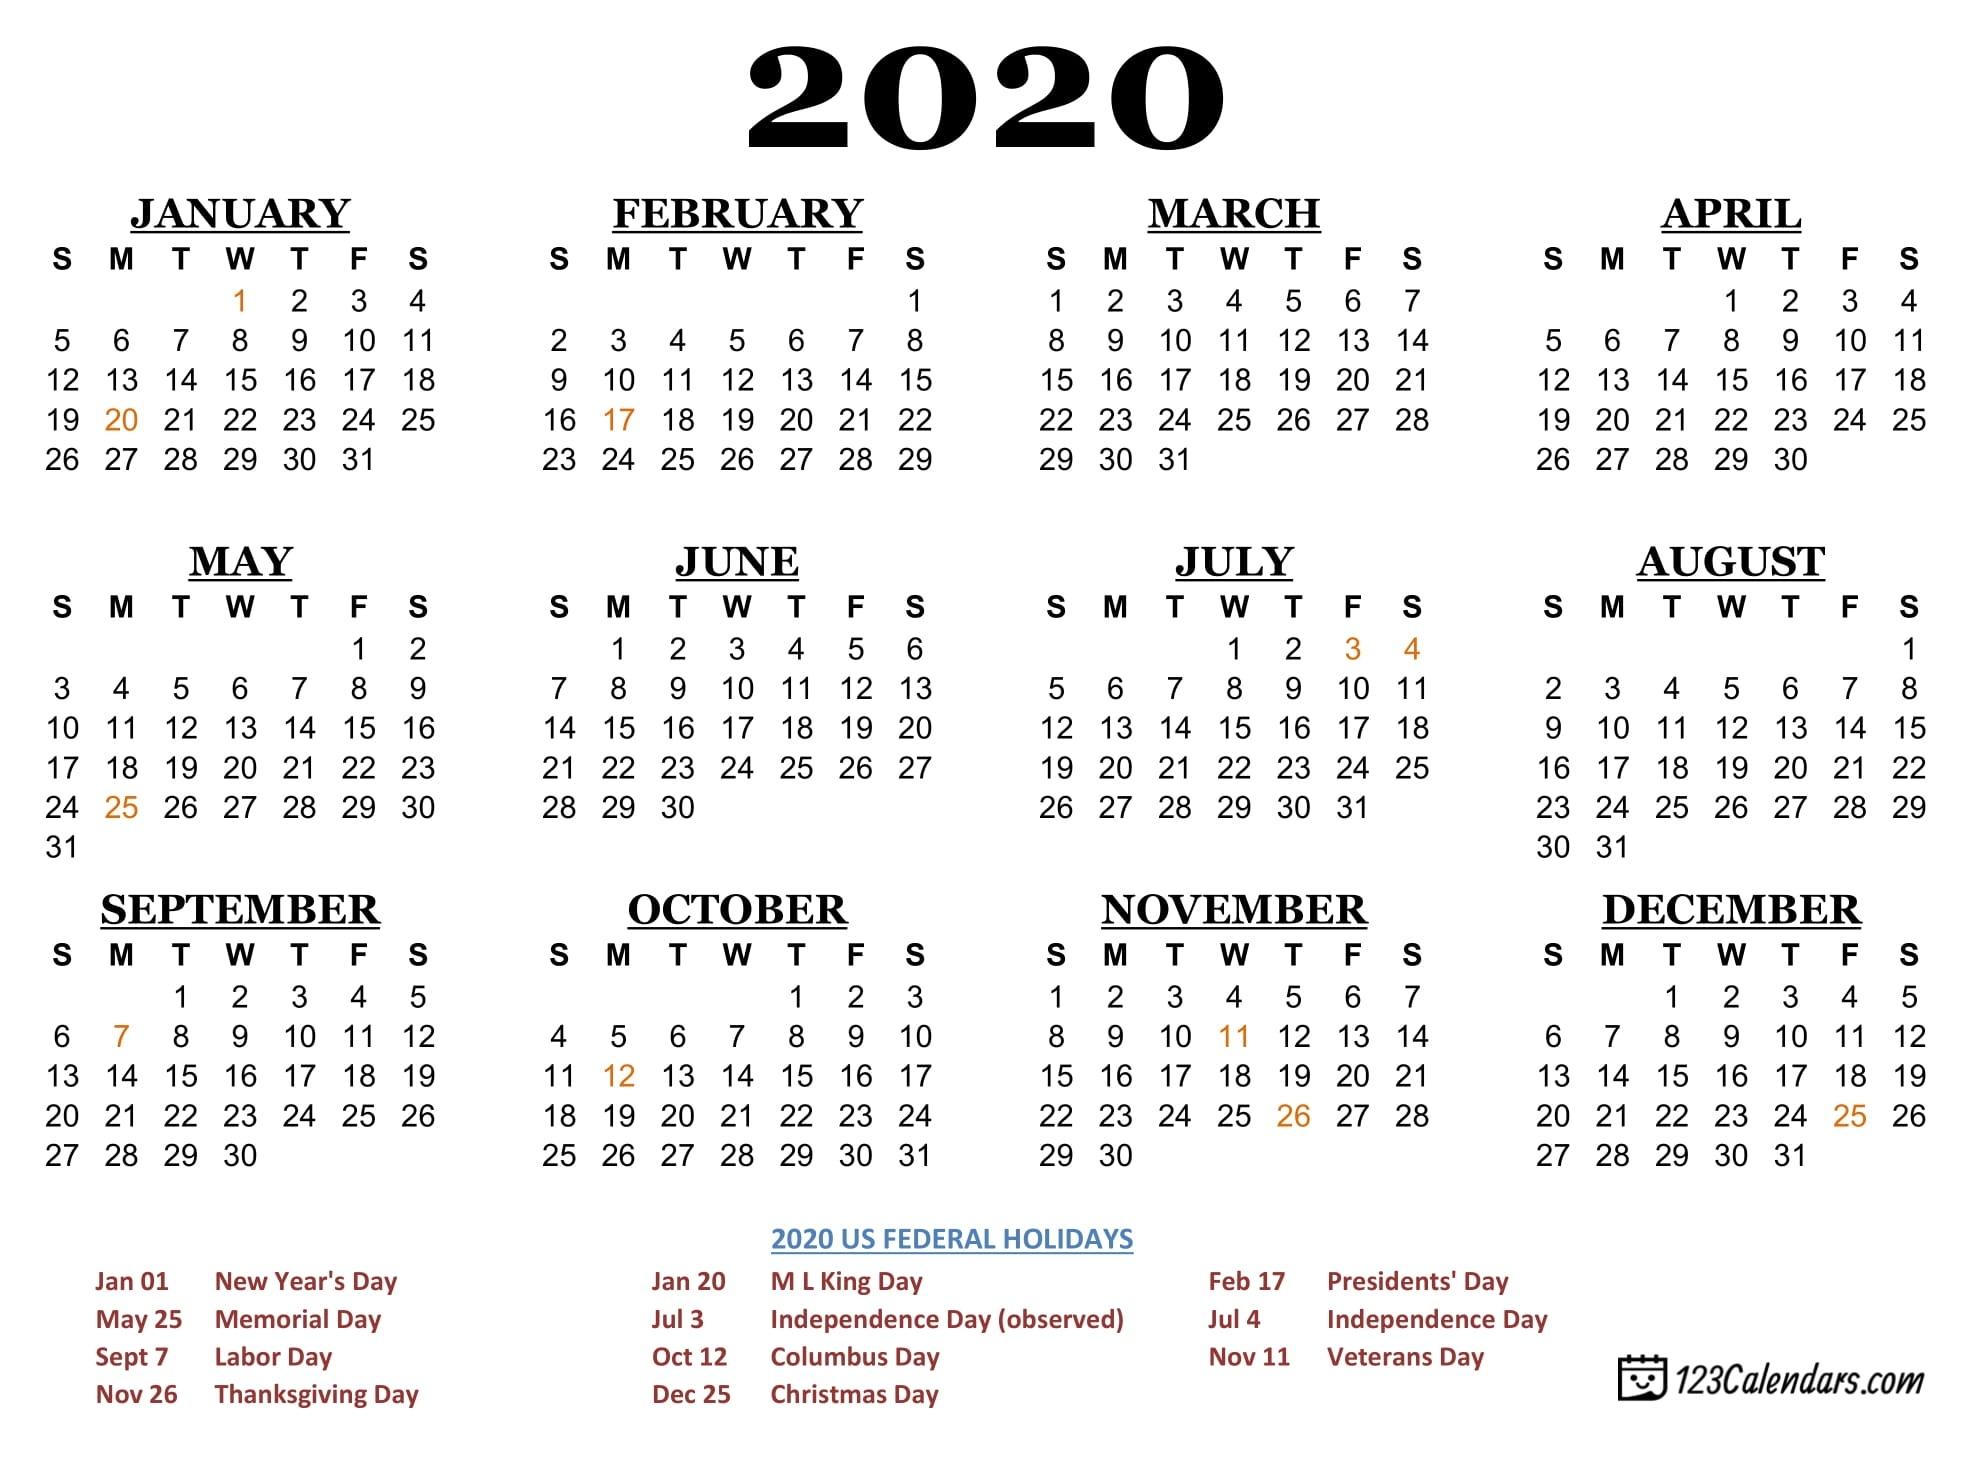 Free Printable 2020 Calendar | 123Calendars Christmas Calendar 2020 Printable Free